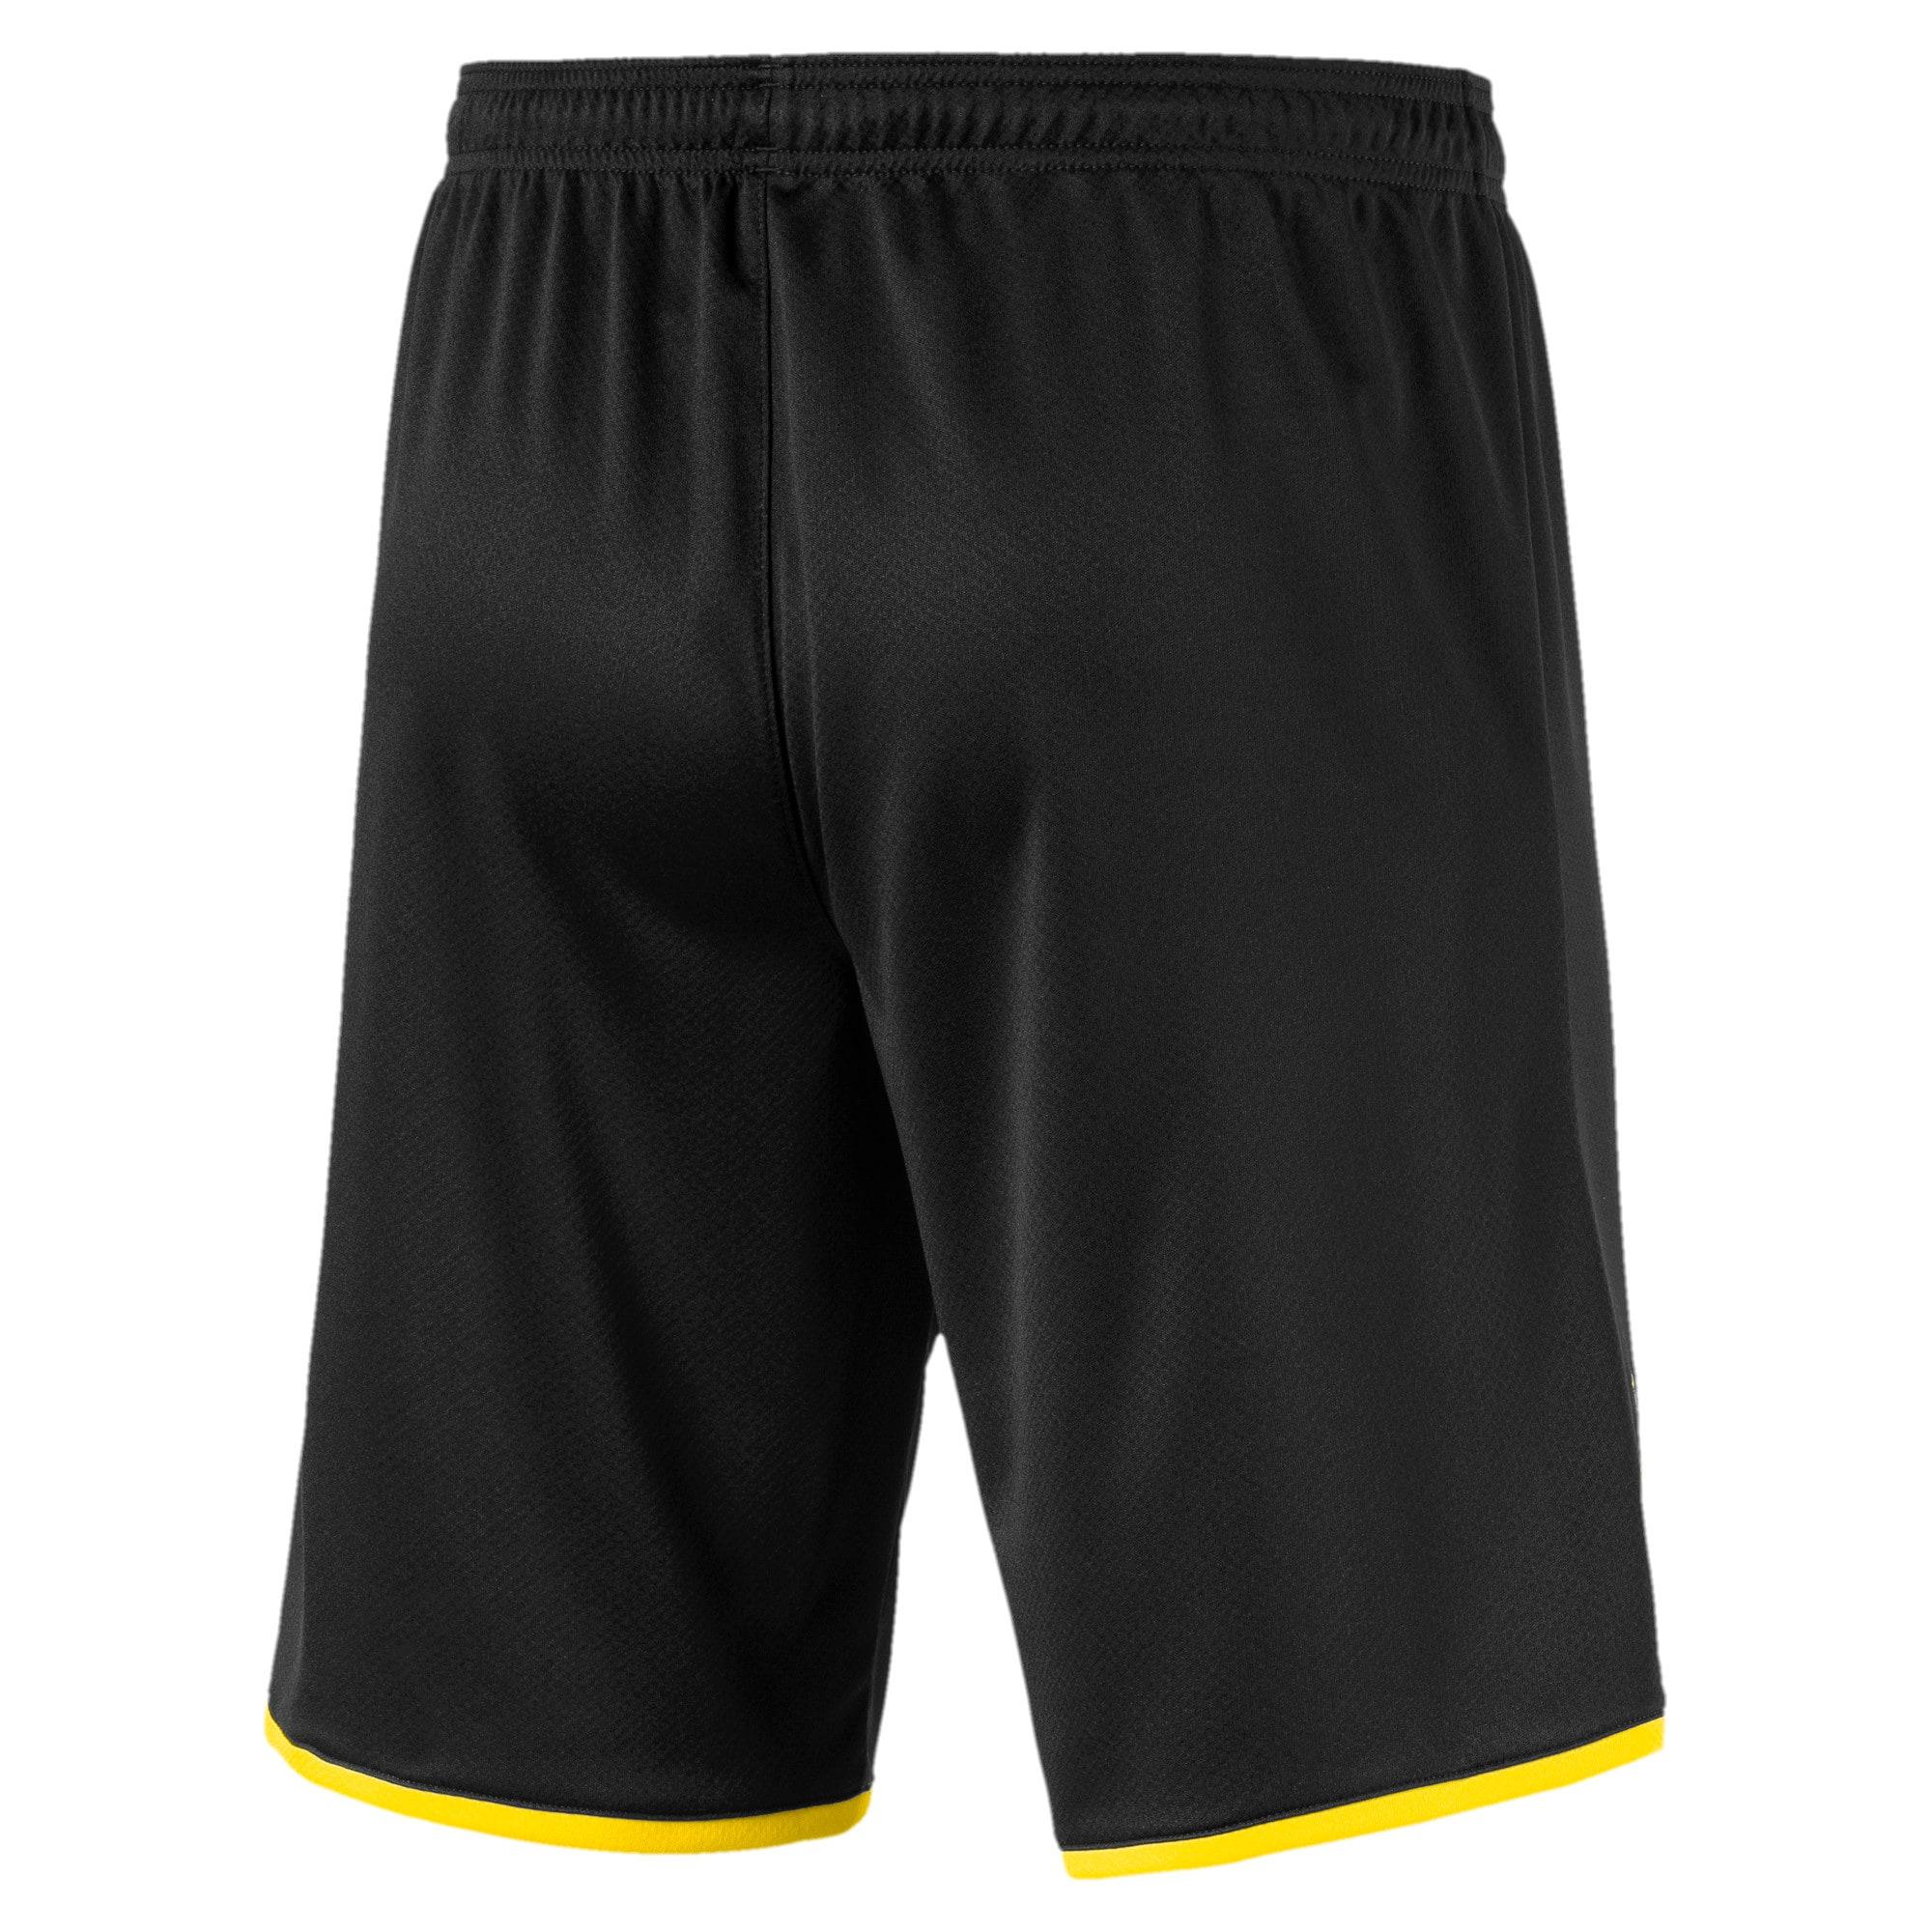 Thumbnail 2 of BVB Men's Away Replica Shorts, Puma Black-Cyber Yellow, medium